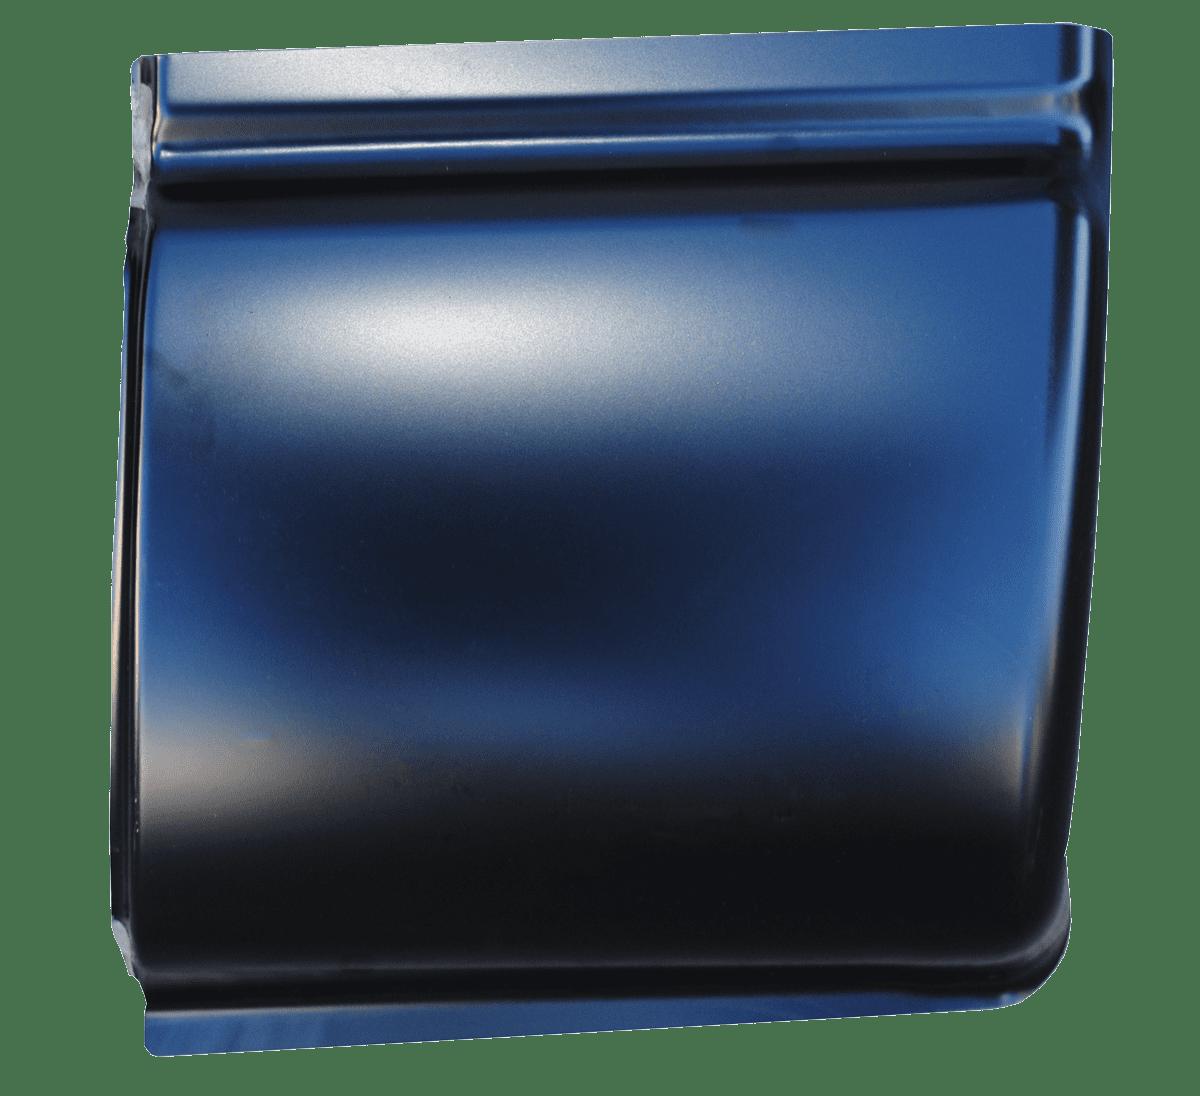 1986-93 S10/S15 Pickup/Blazer/Jimmy (w/ Side Vents Cut Out